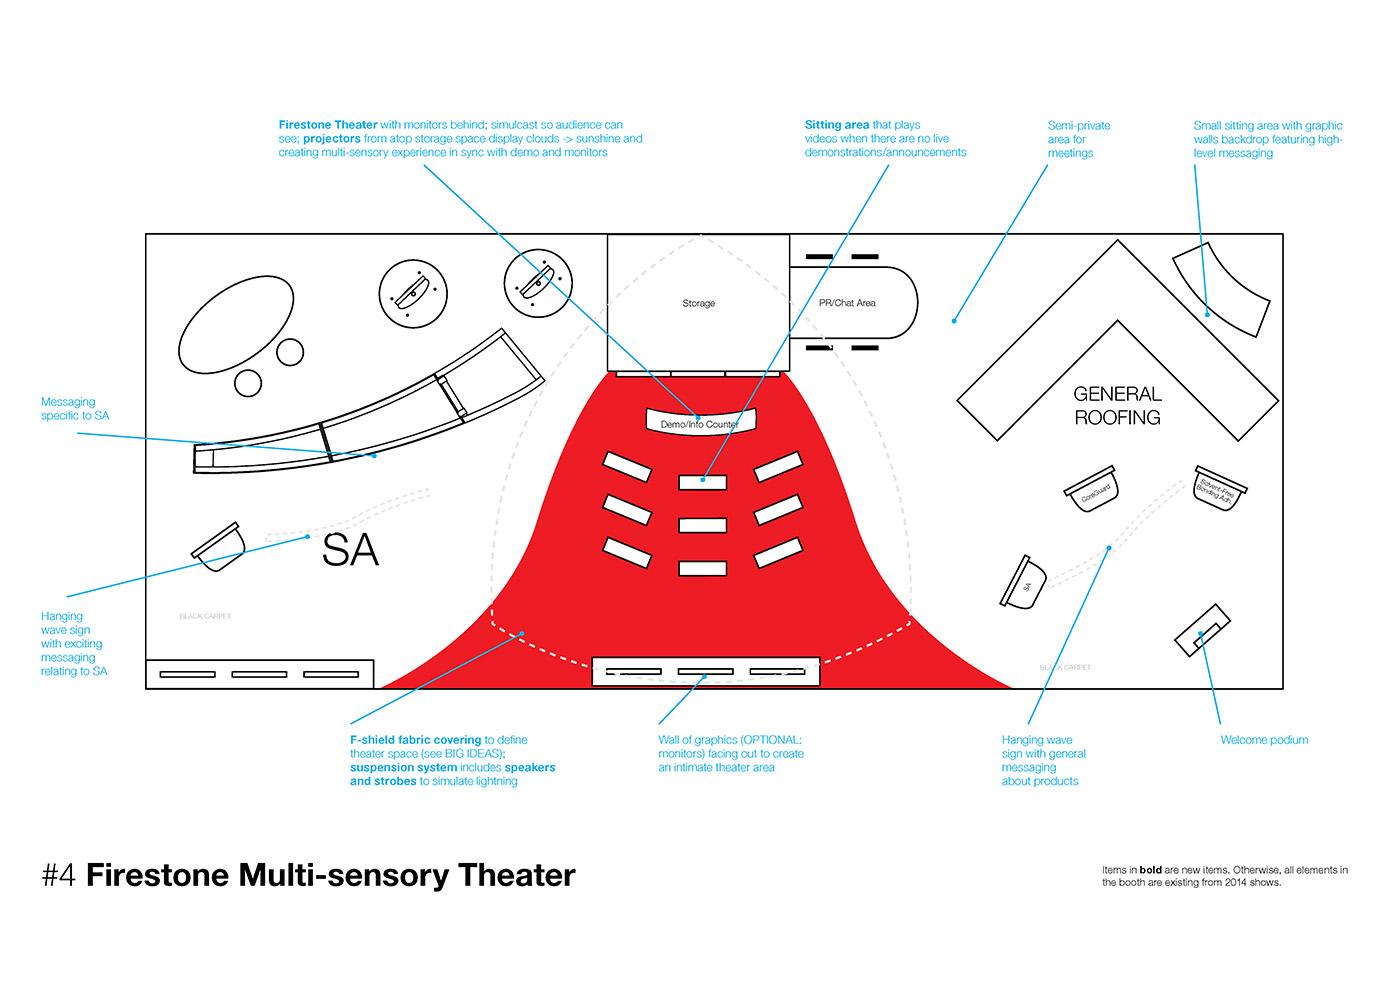 Firestone BP Multi-sensory Theater